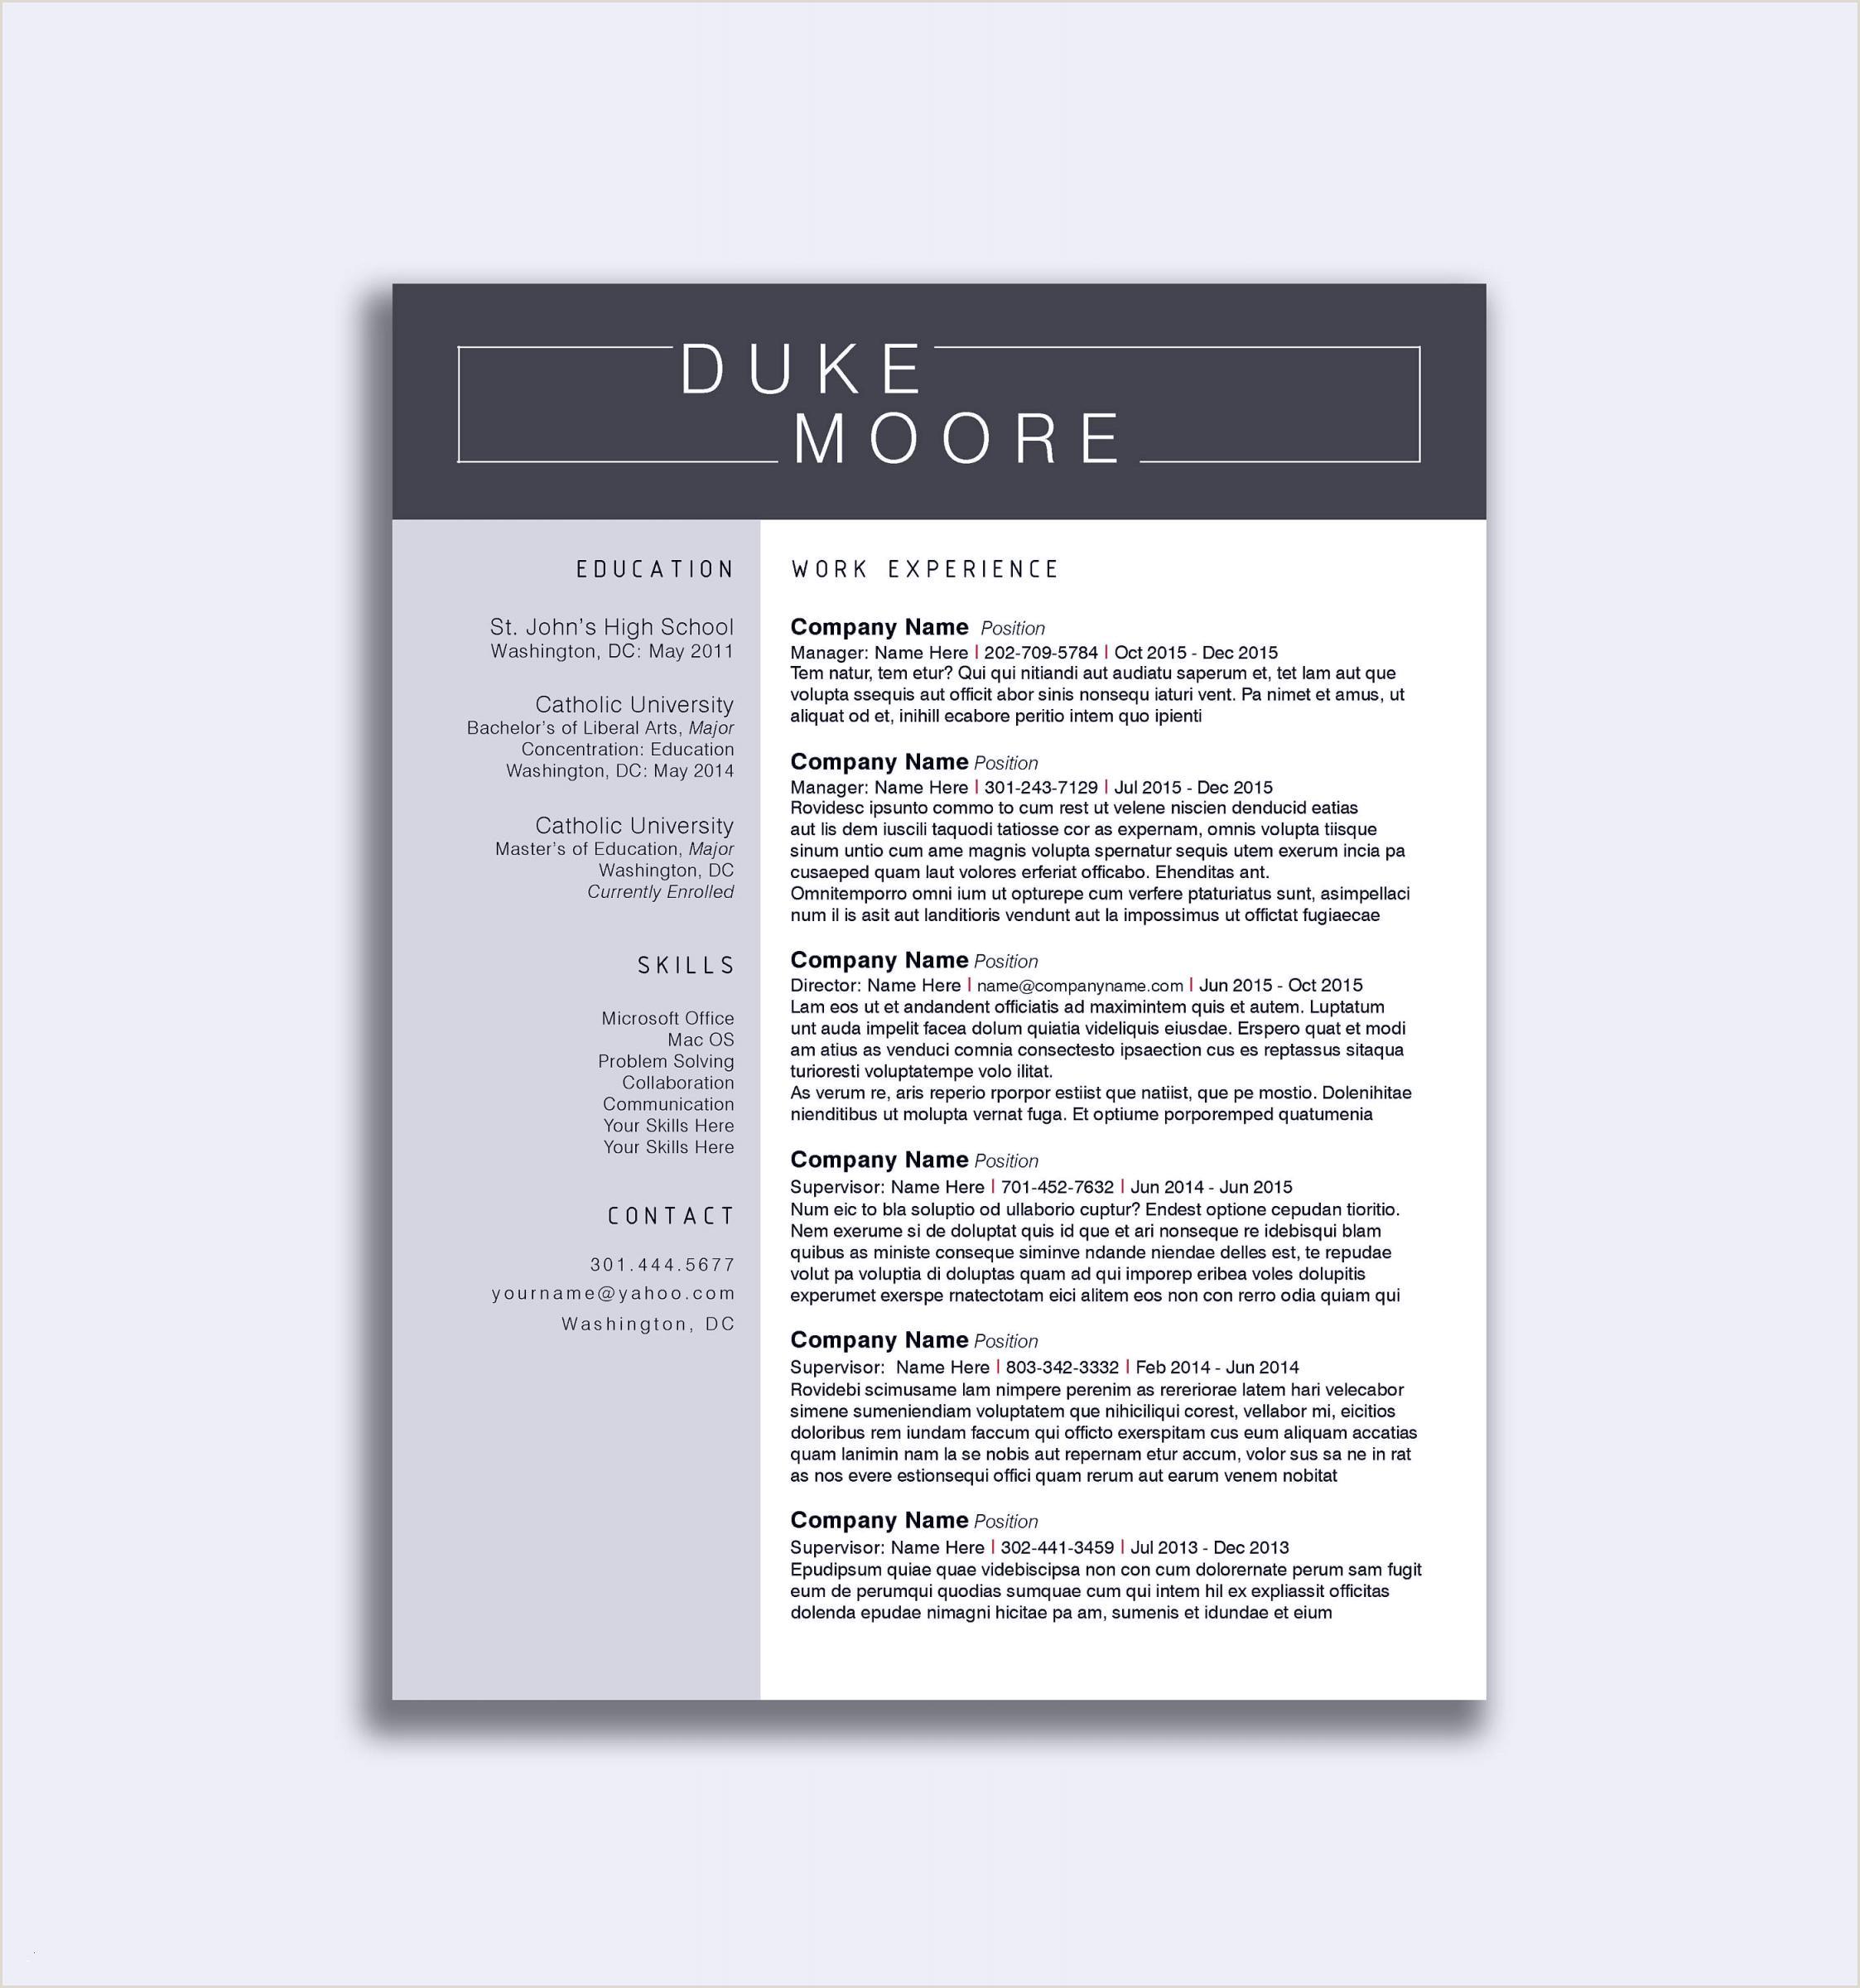 15 bewerbung deckblatt muster word